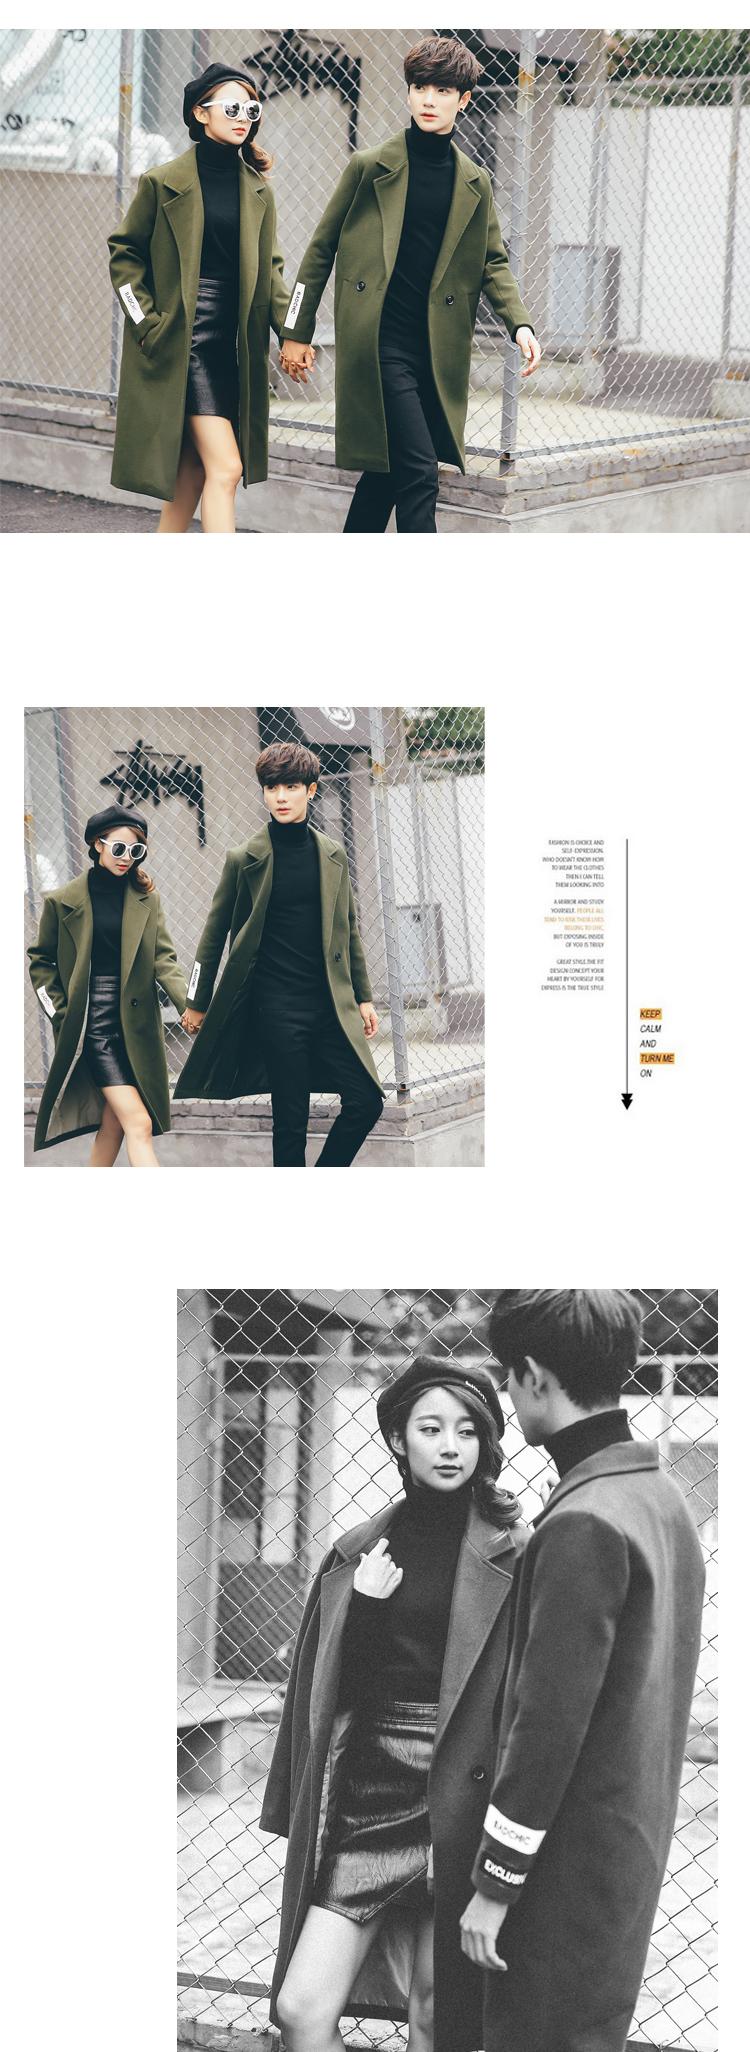 Taobao Olive Coat